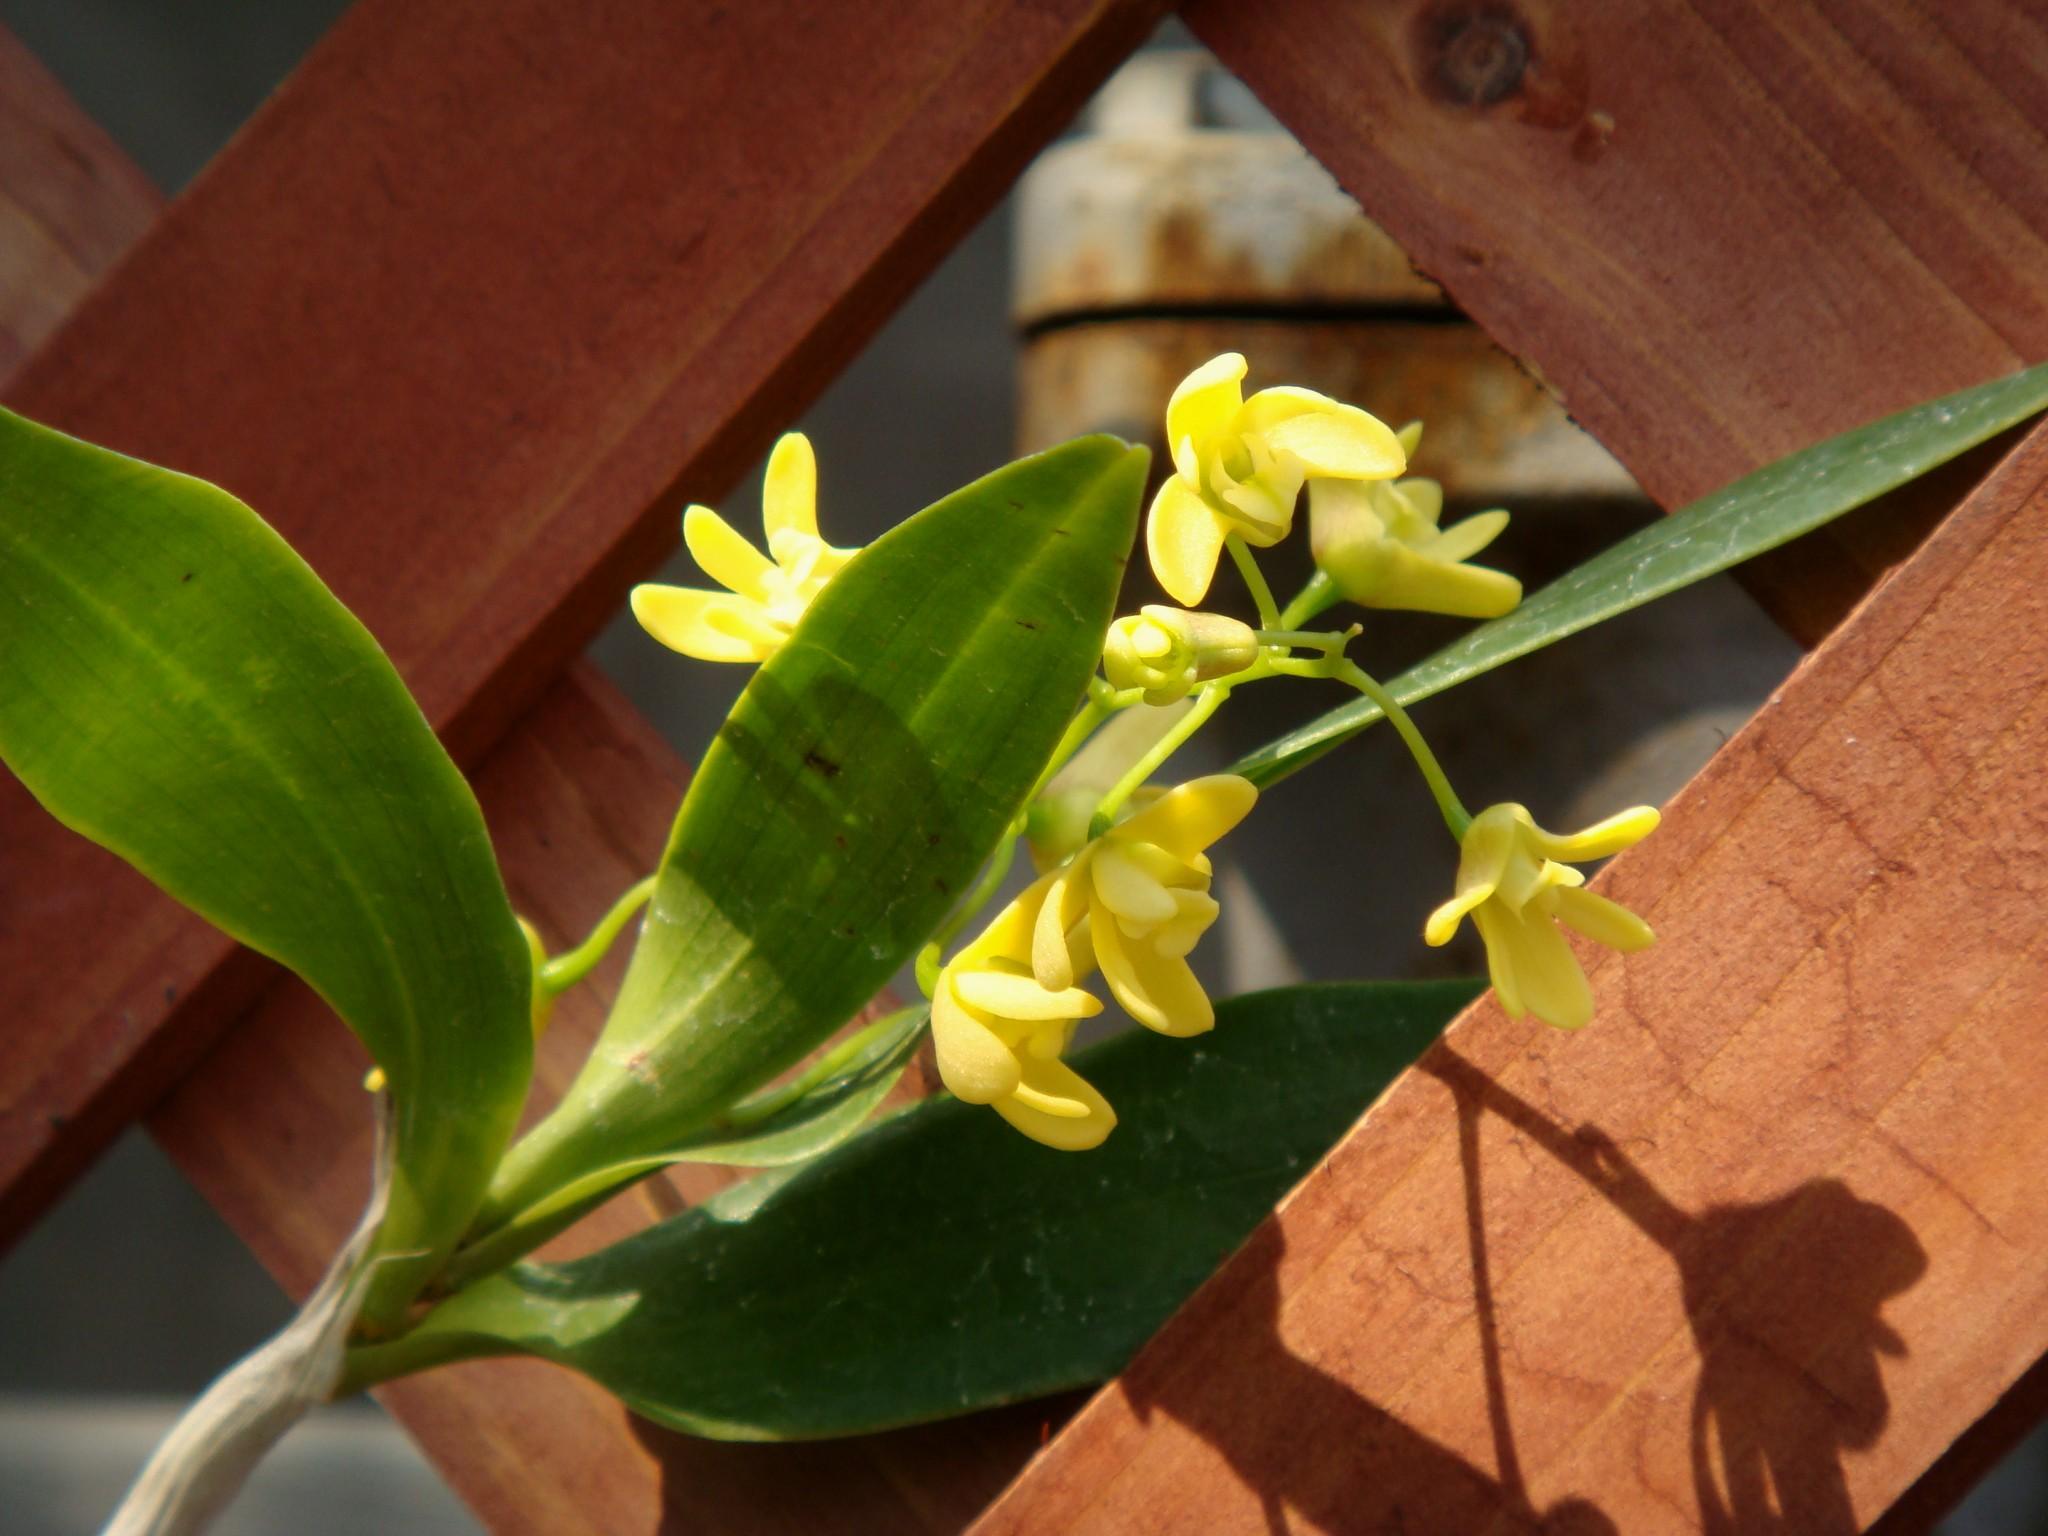 http://orchids.la.coocan.jp/Dendrobium/Dendrobium%20comptonii/DSC04142.JPG